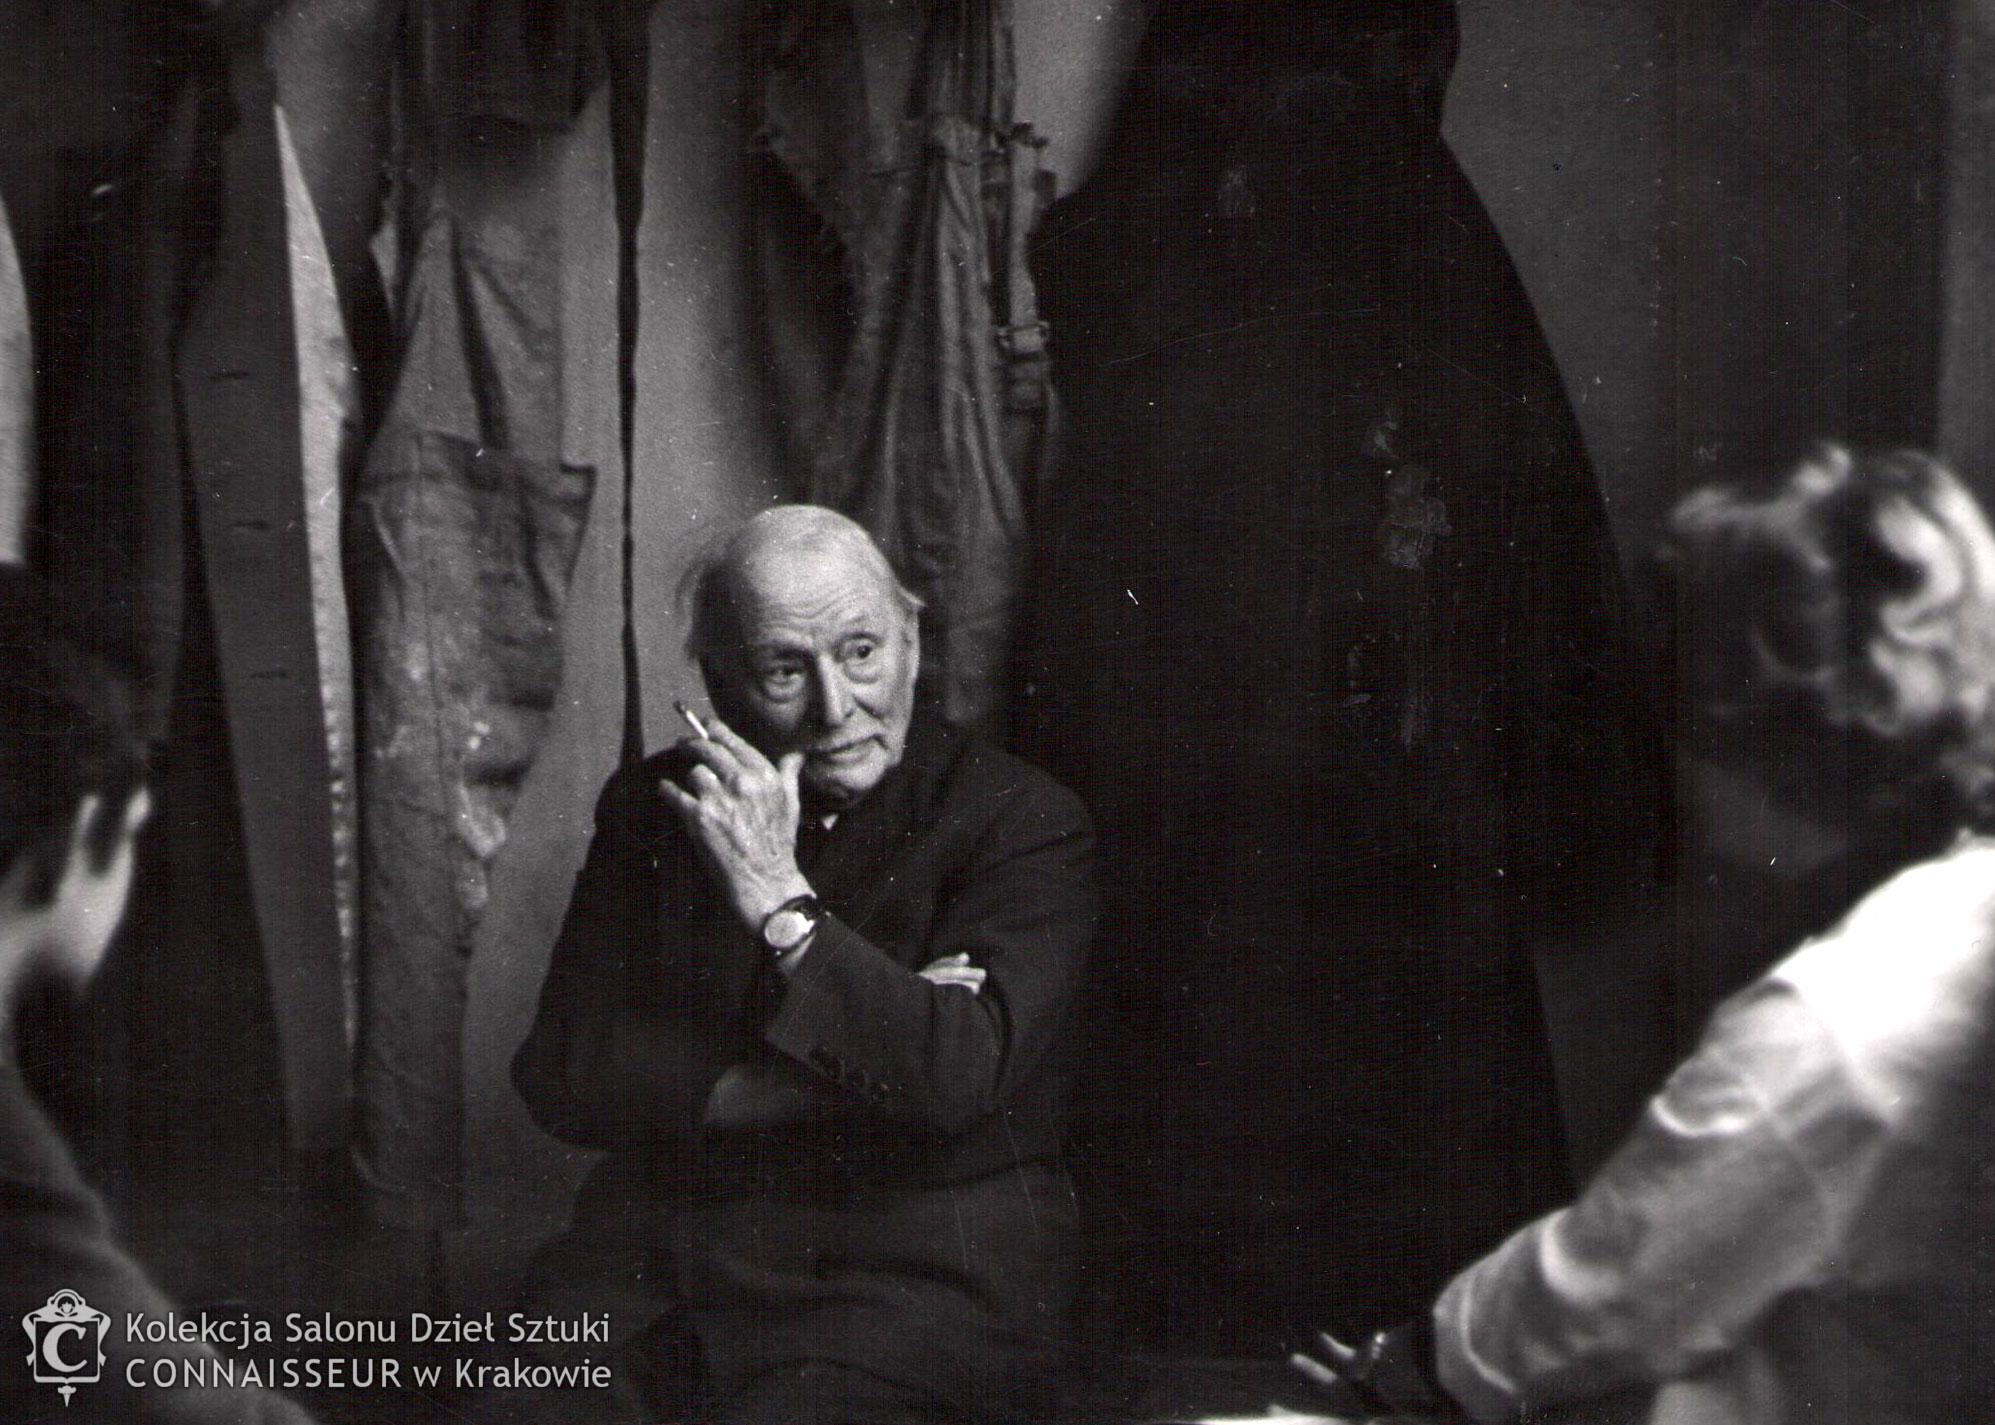 Xawery Dunikowski ze studentami, źródło: Salon Dzieł Sztuki Connaisseur